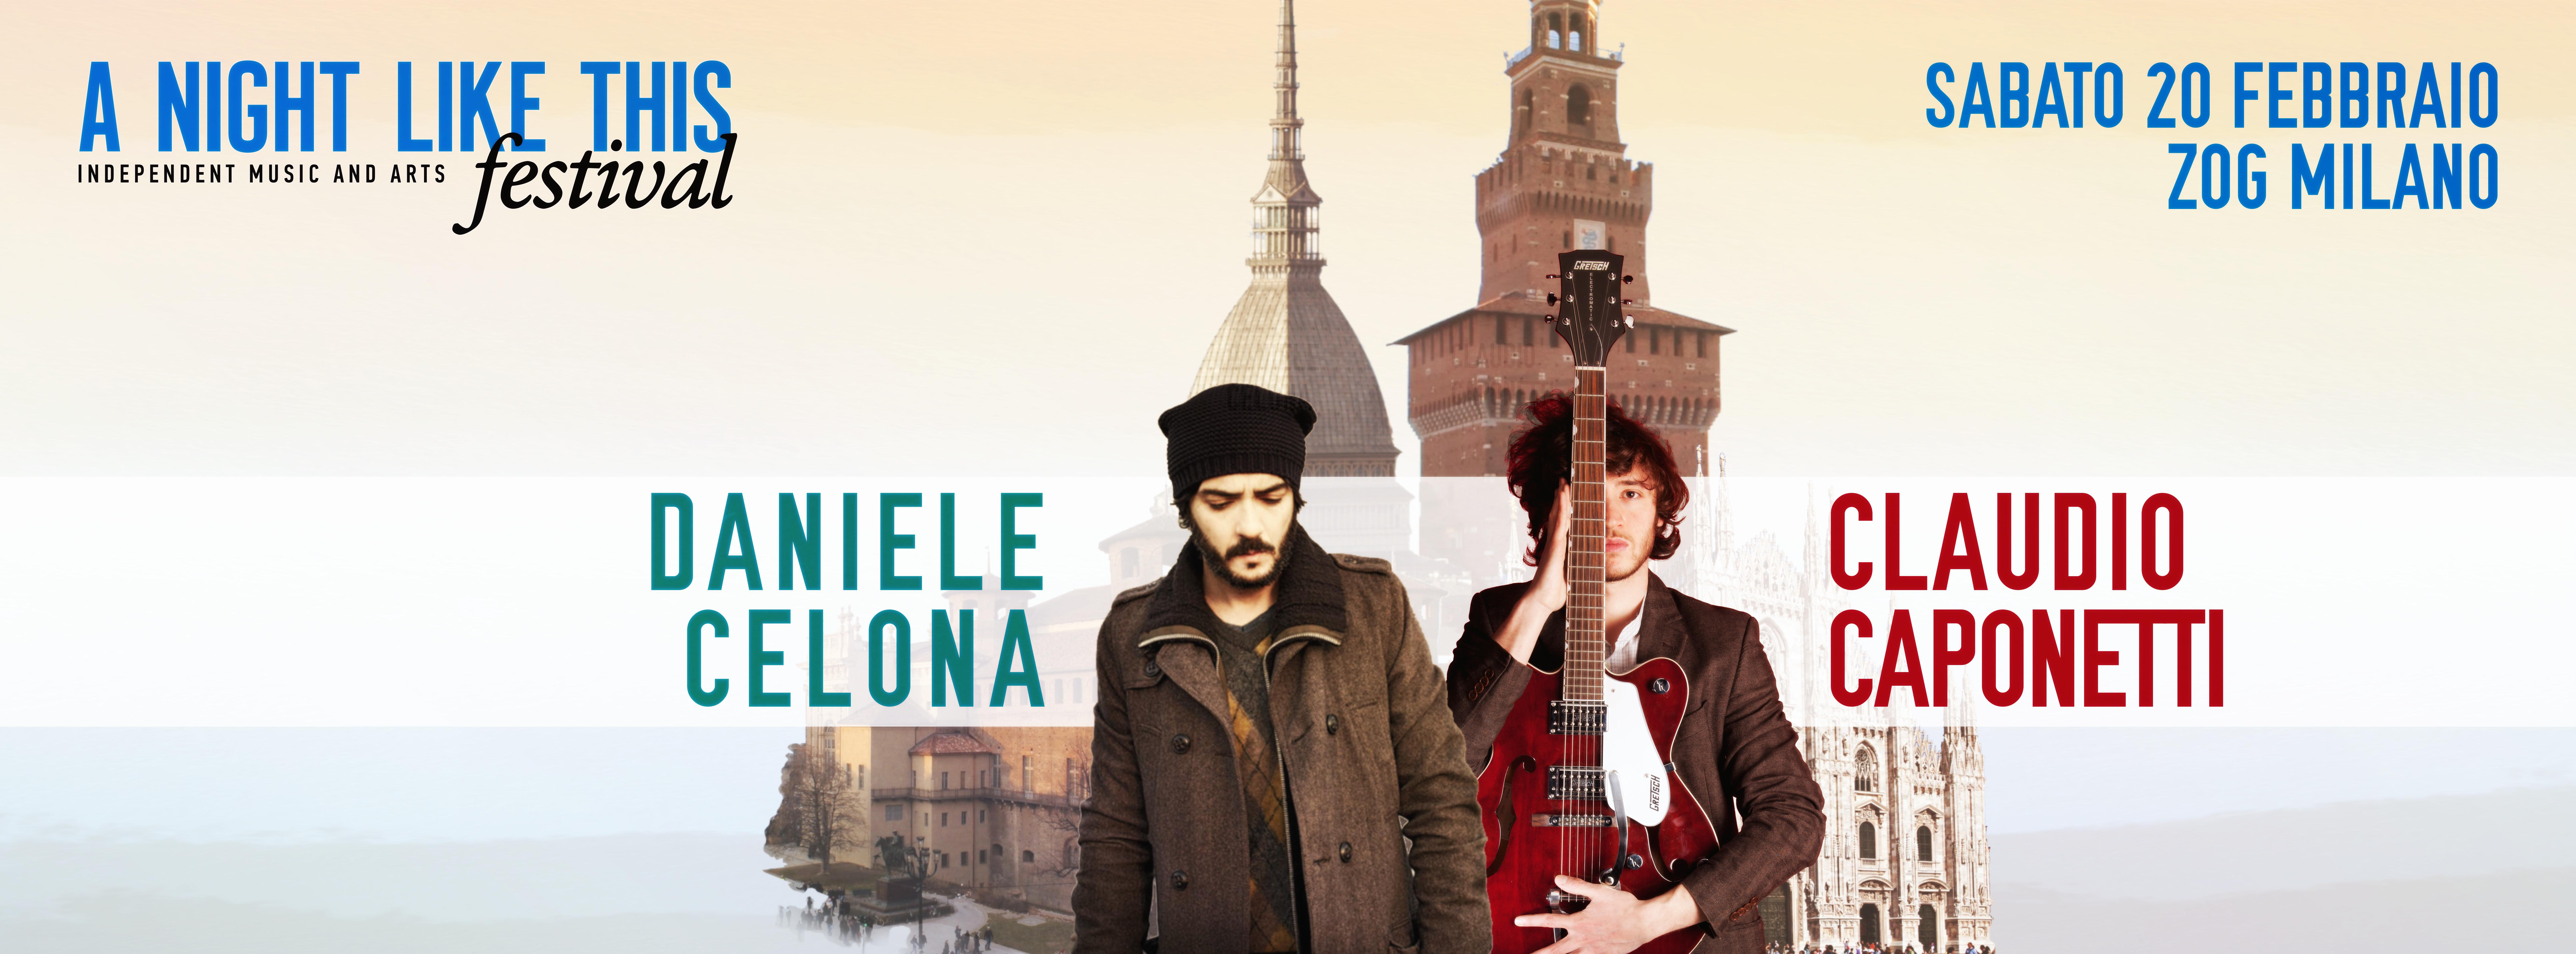 A NIGHT LIKE THIS Festival presenta DANIELE CELONA live - Opening act: Claudio Caponetti